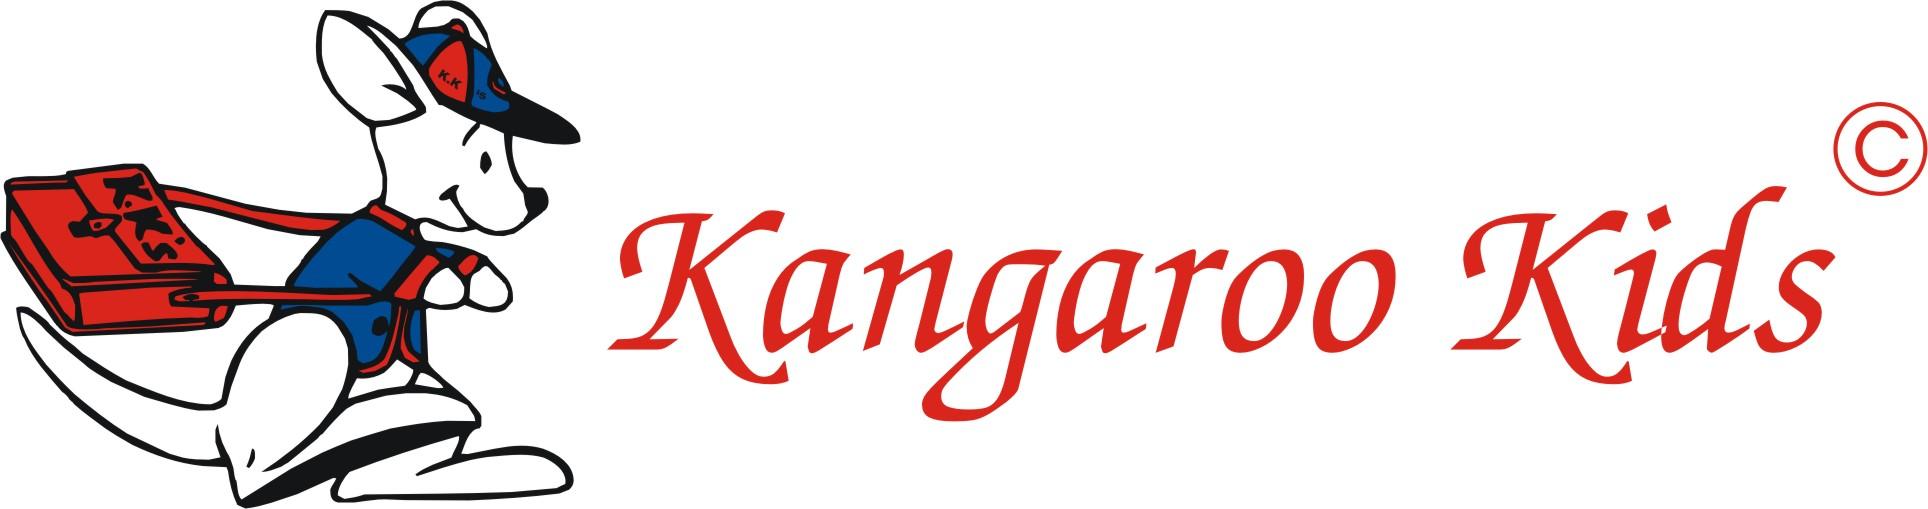 Kangaroo Kids - Malad - Mumbai Image